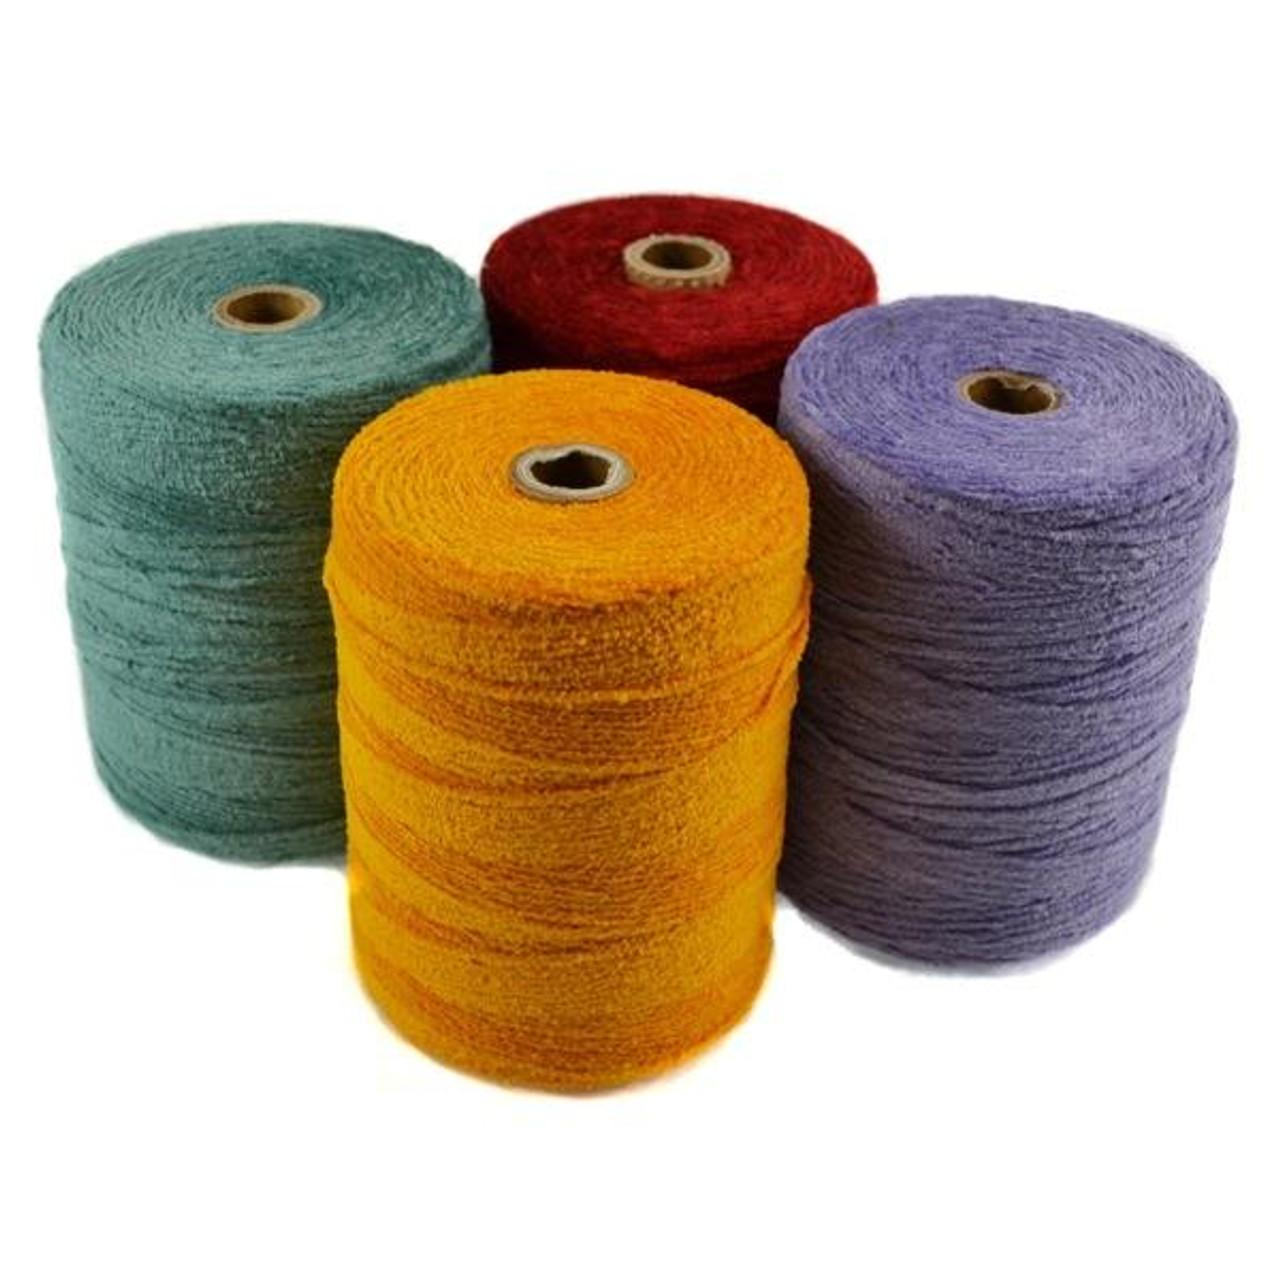 Maurice Brassard Cotton Chenille Yarn | The Woolery